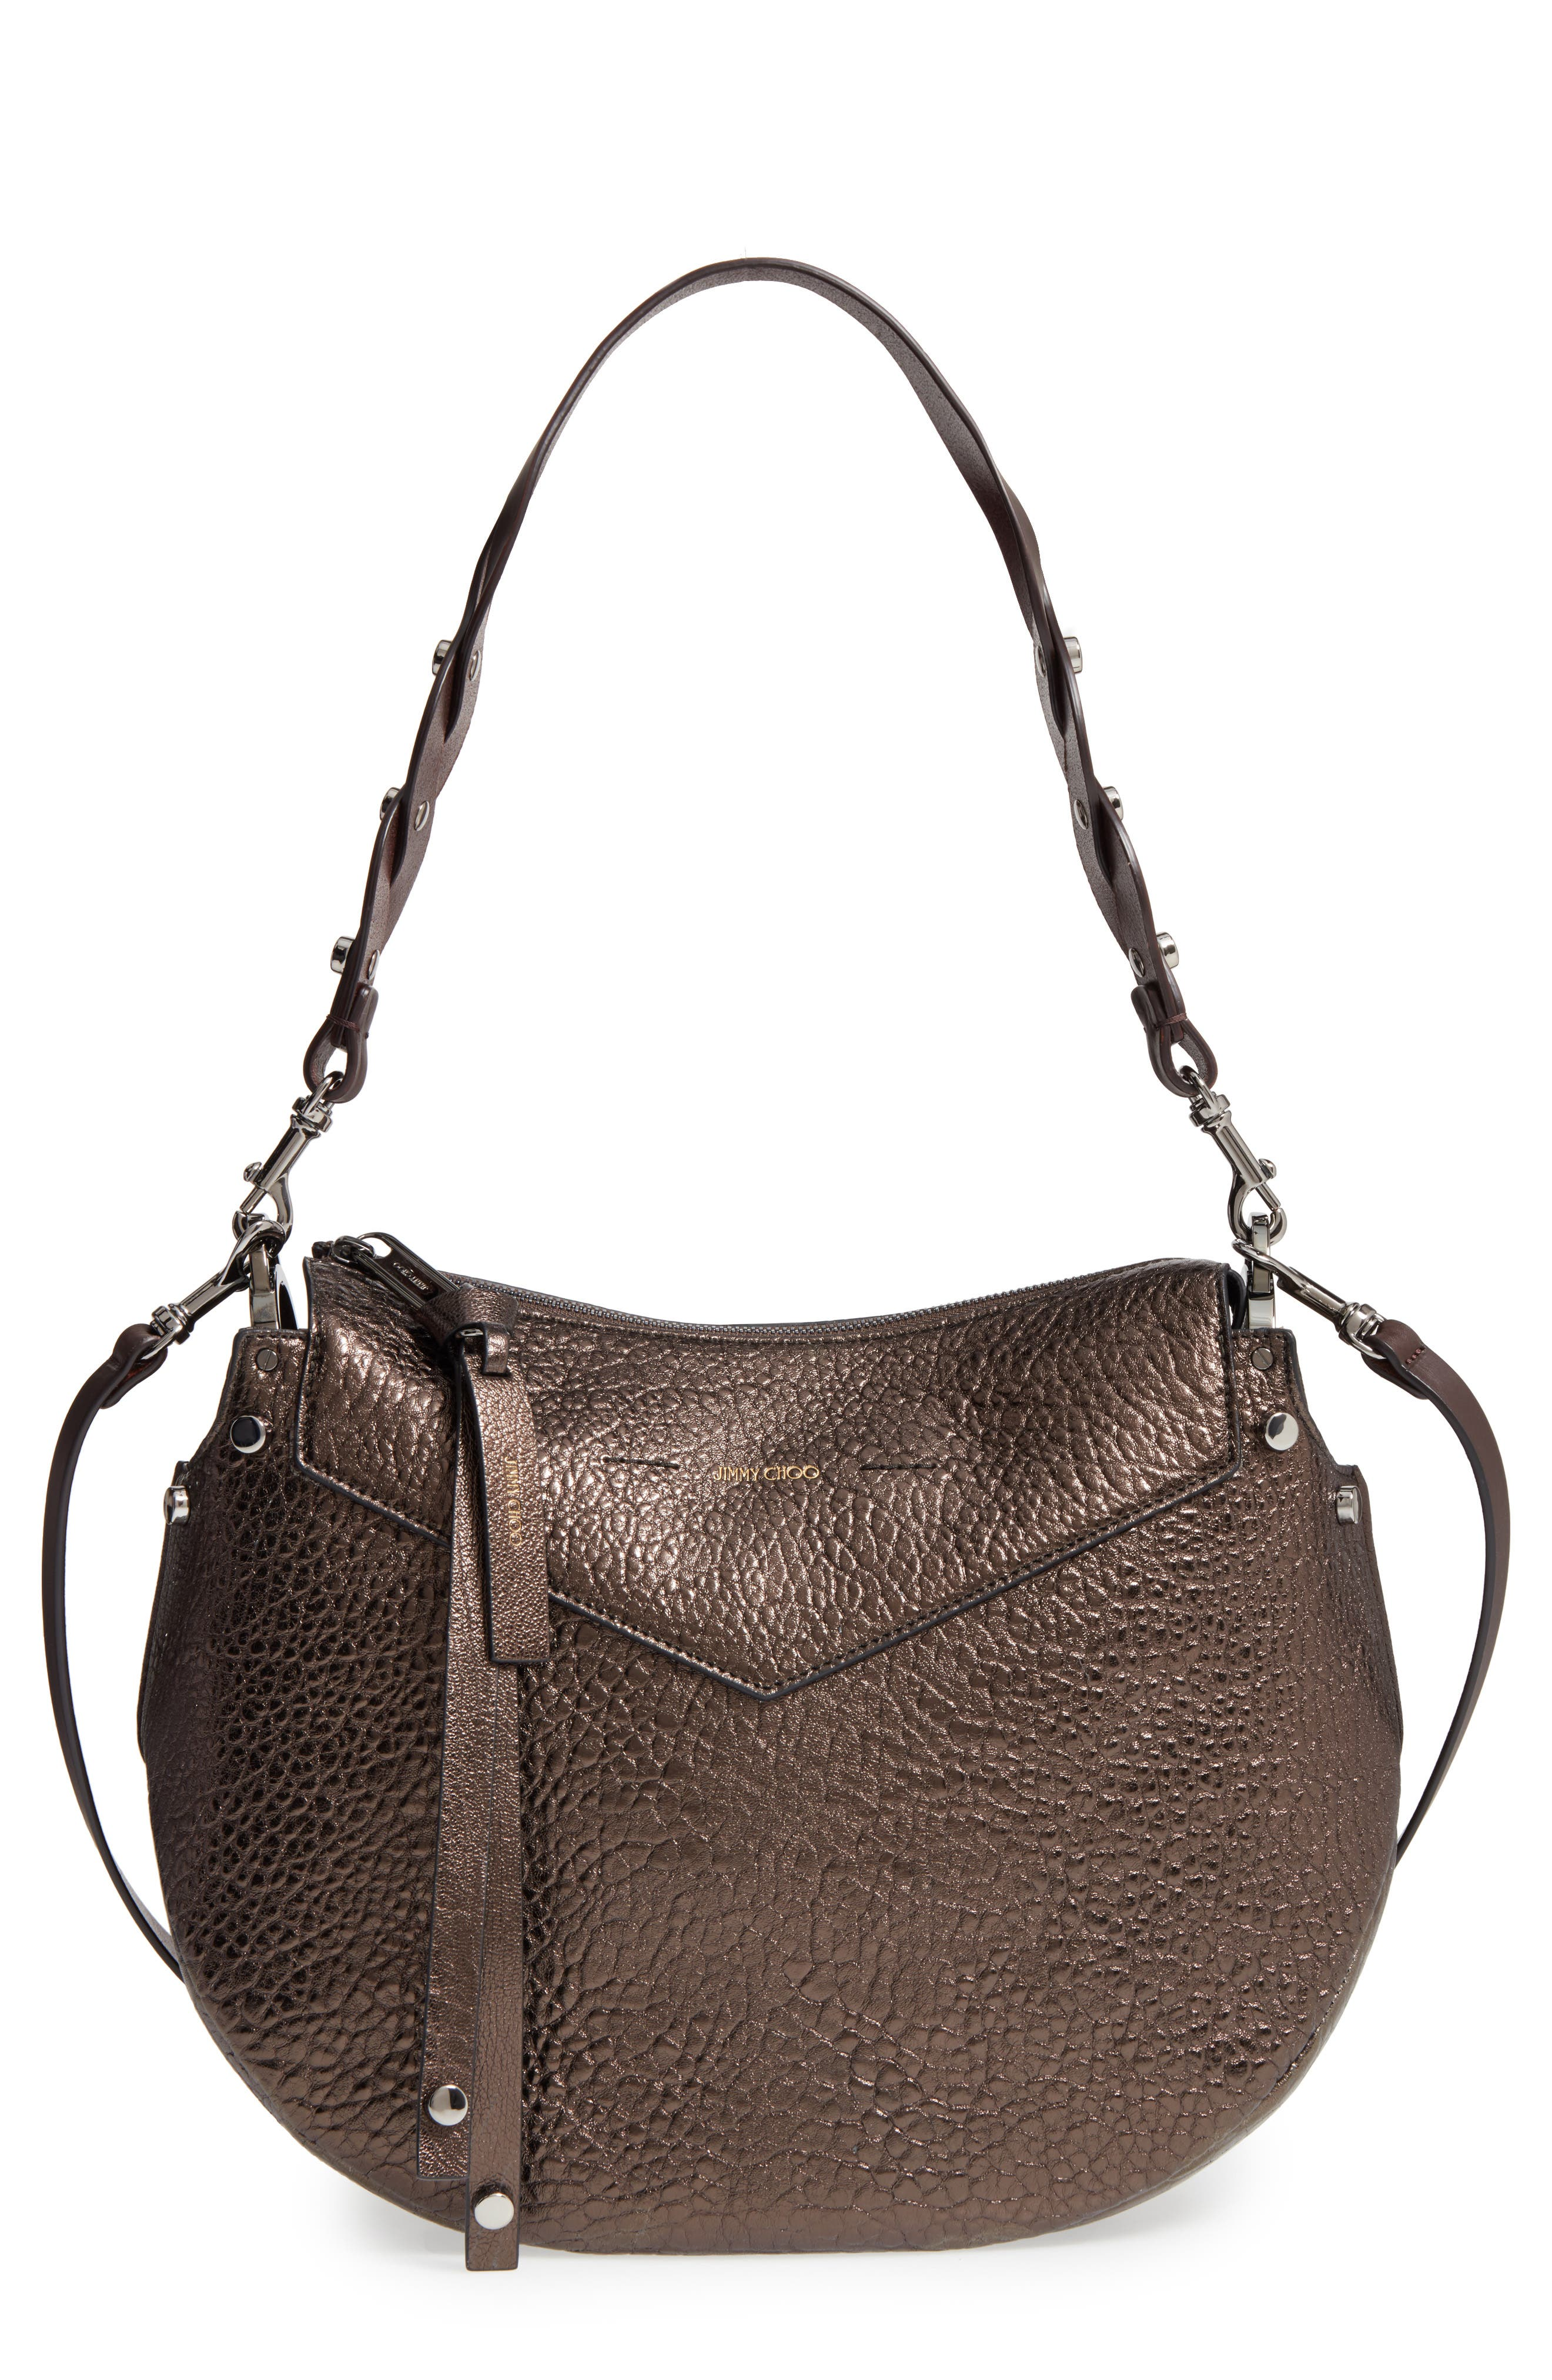 Artie Metallic Leather Hobo Bag,                         Main,                         color, 200